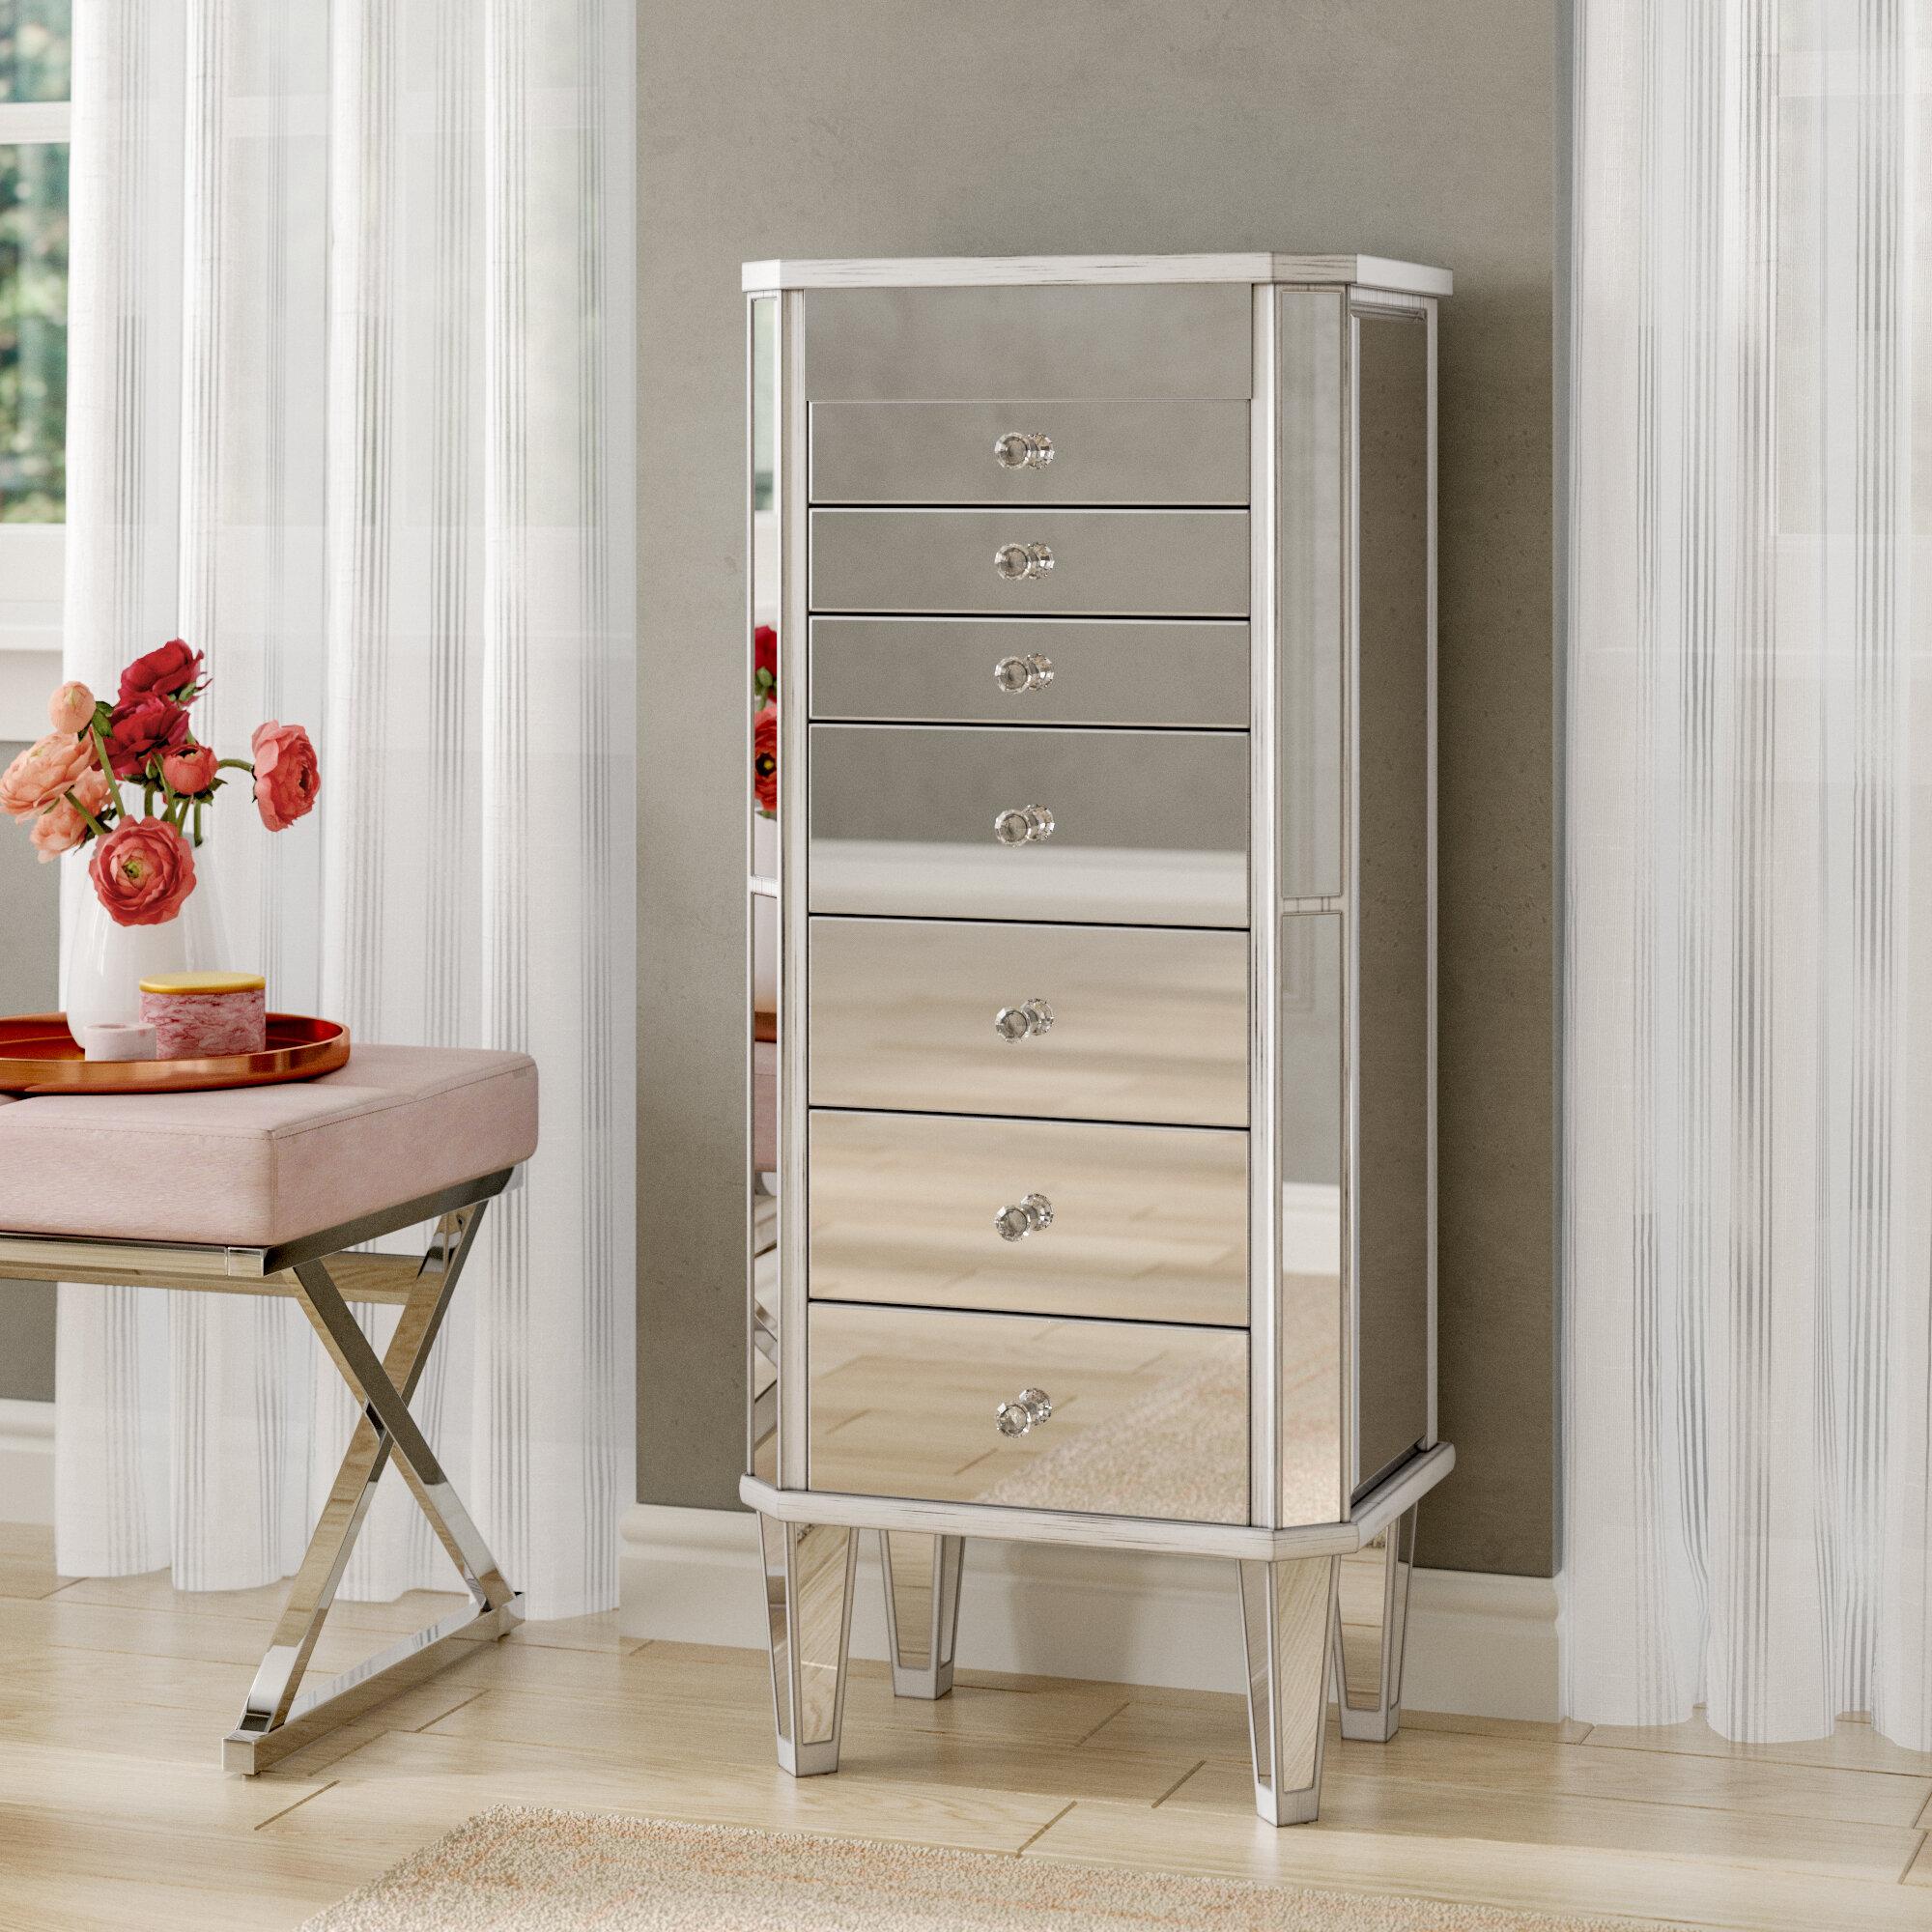 House of hampton ashmore mirrored jewelry armoire reviews wayfair